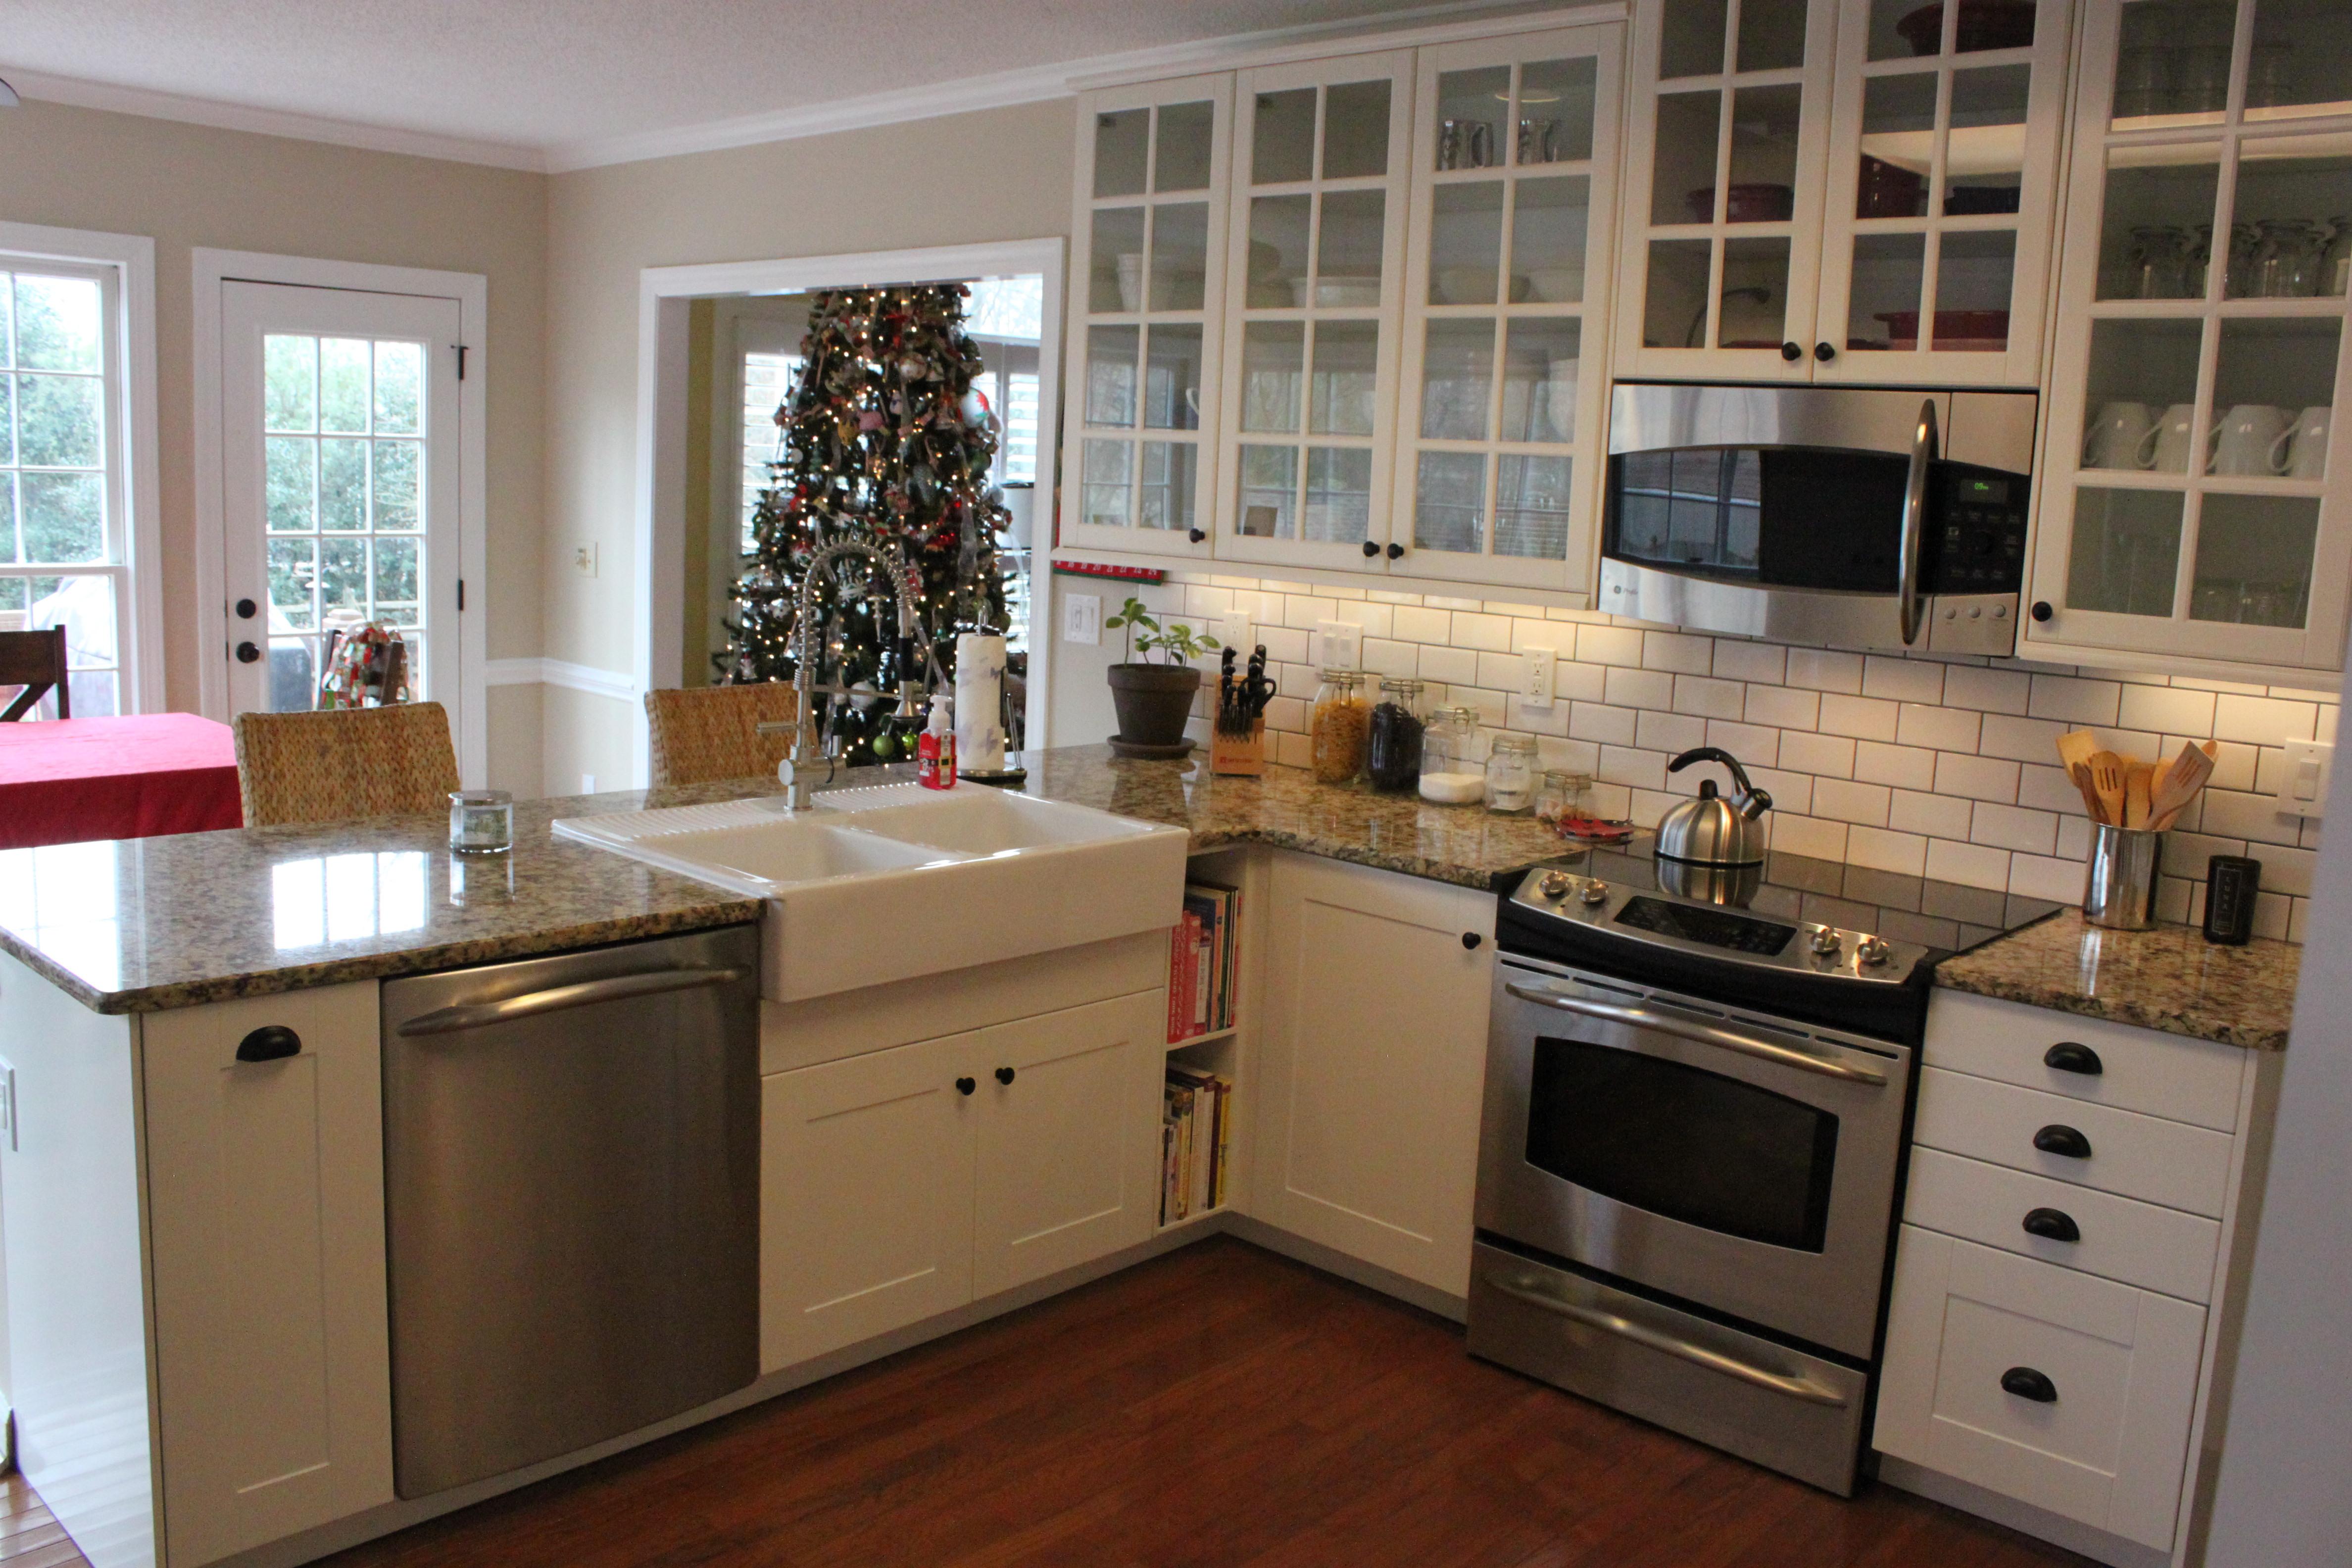 ikea kitchen makeover north carolina ikea kitchen remodel ikea kitchen renovation north carolina 1